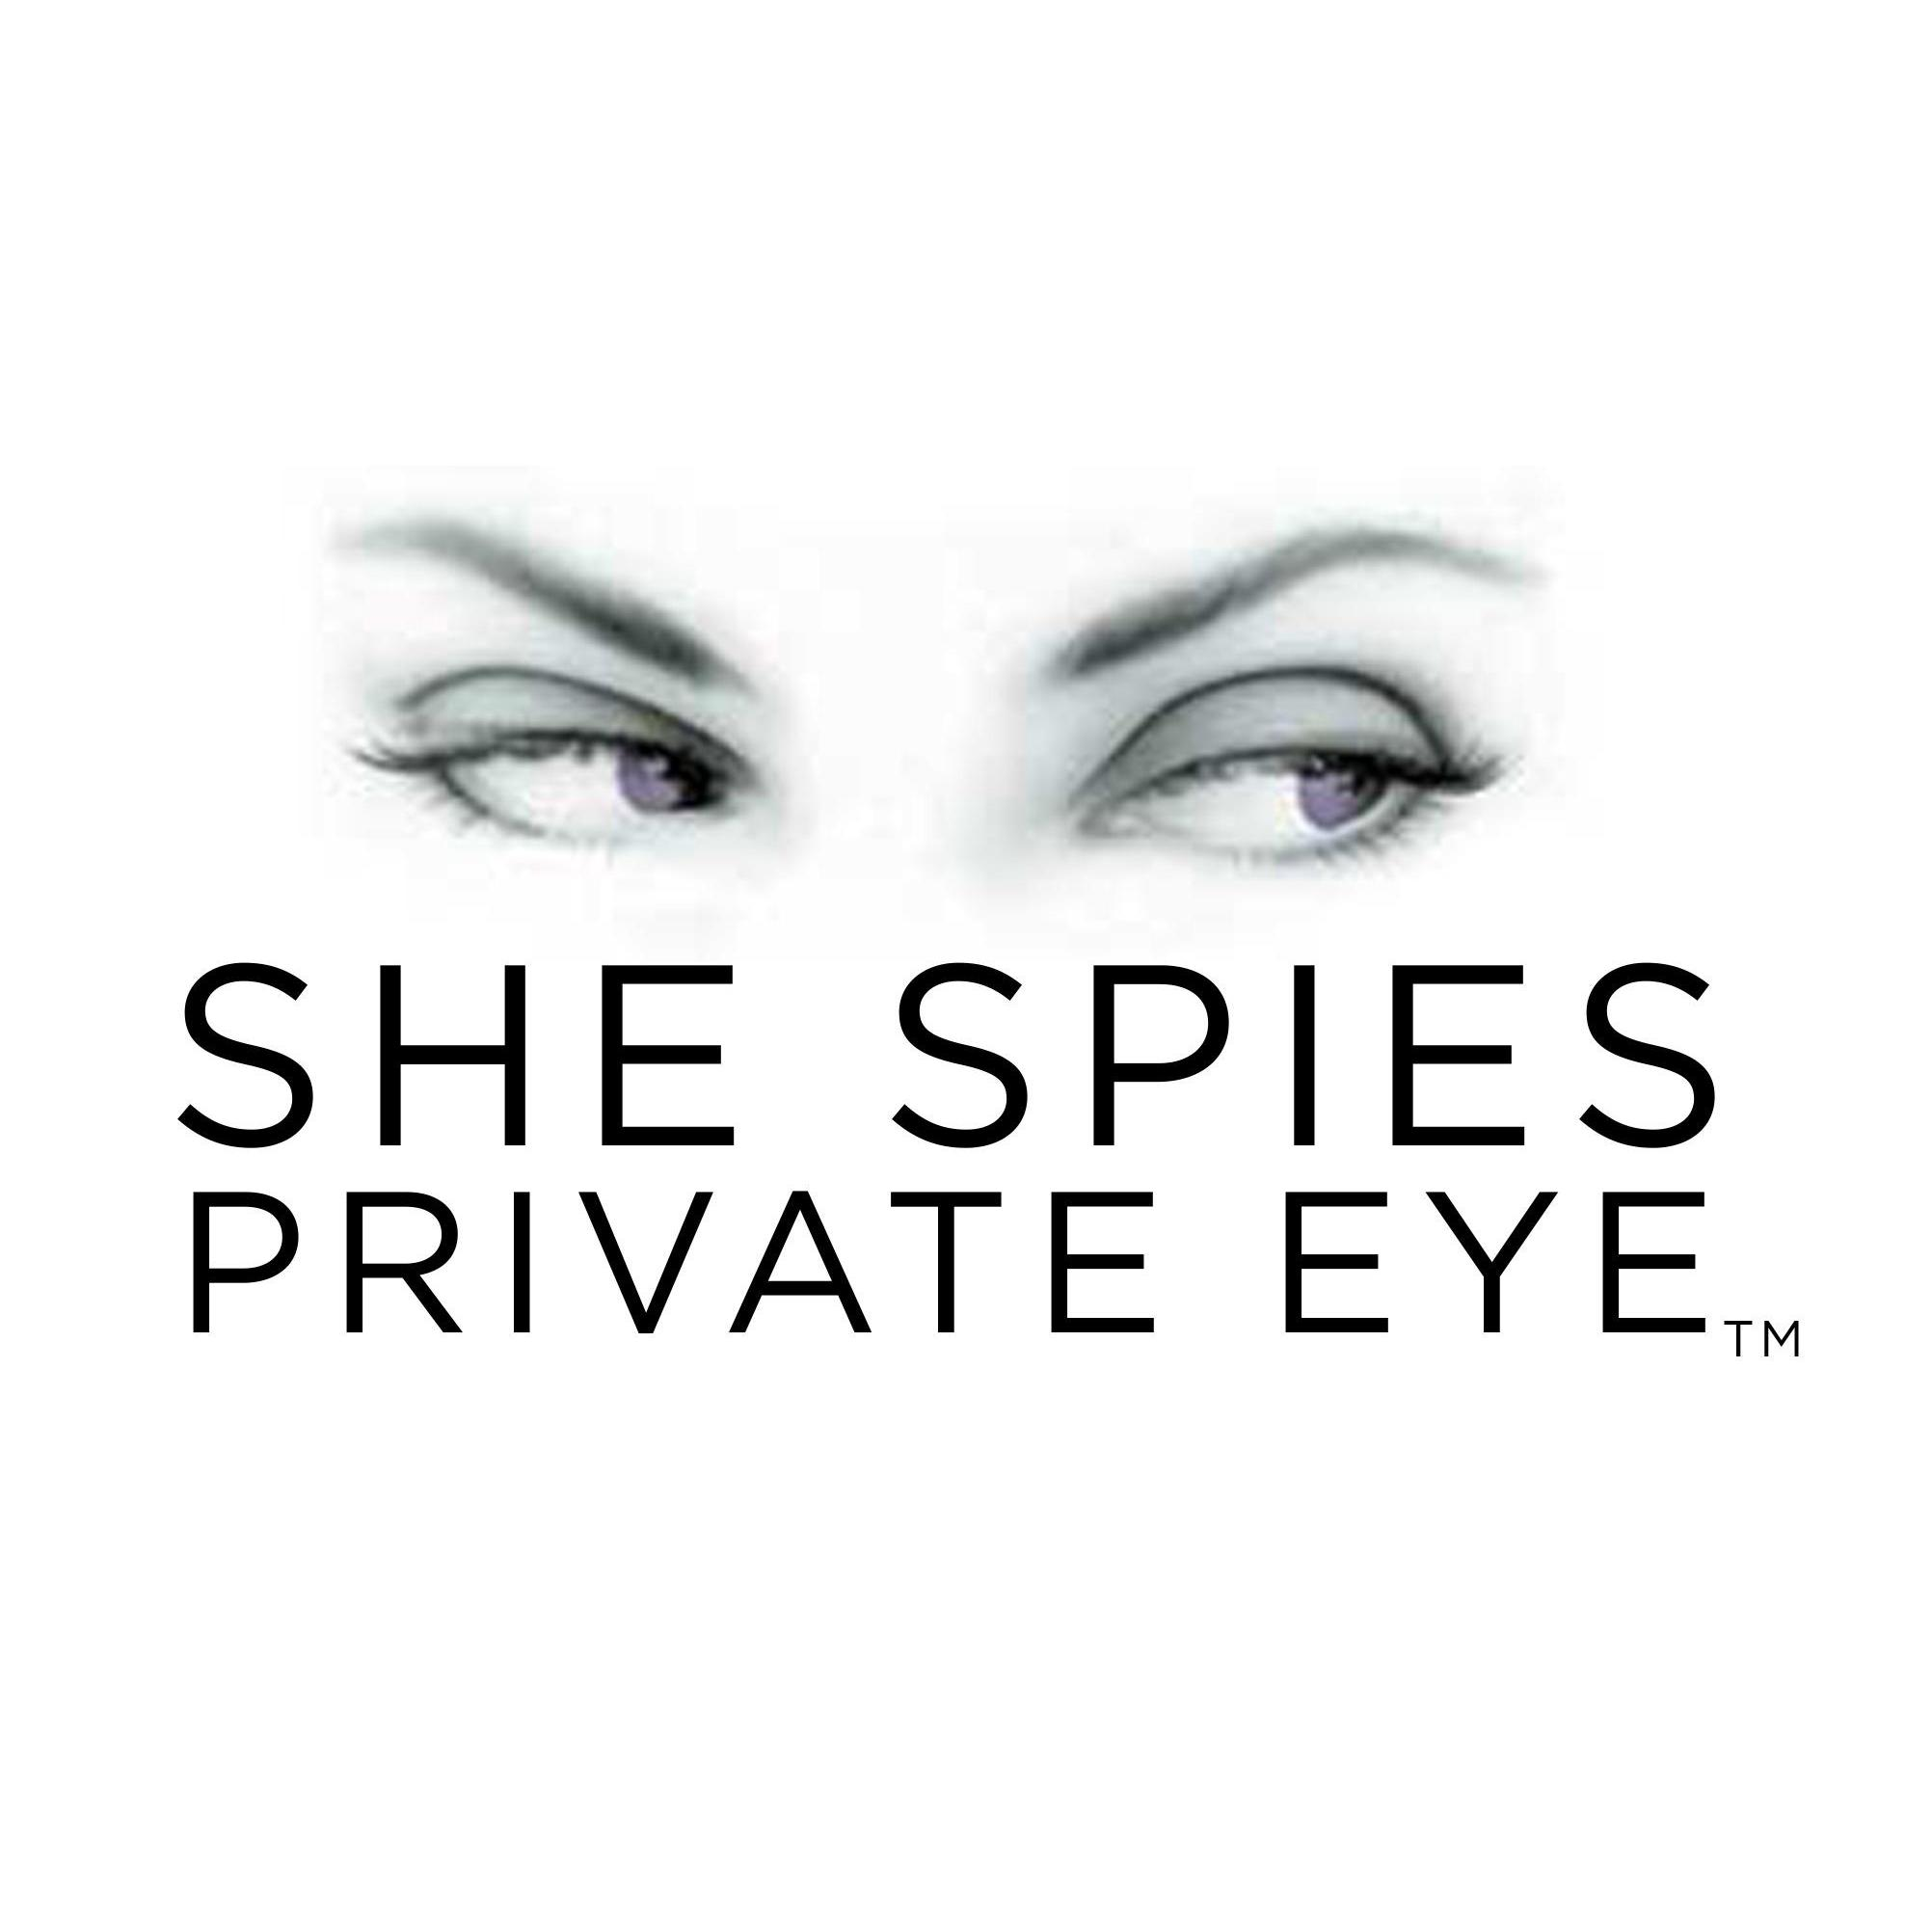 She Spies Private Eye Inc